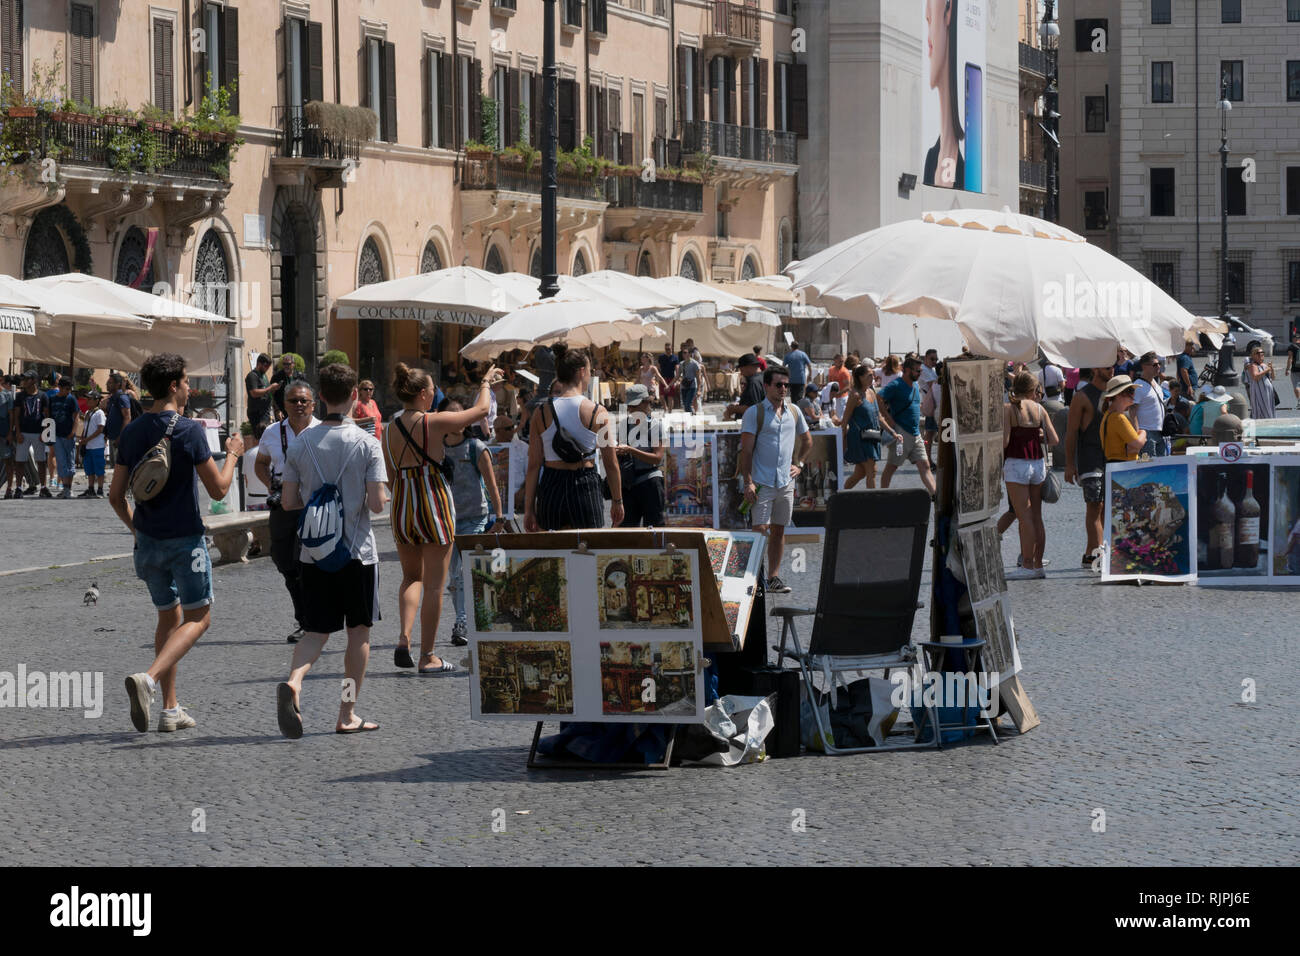 Touristen an der Piazza Navona, Rom, Italien Stockbild